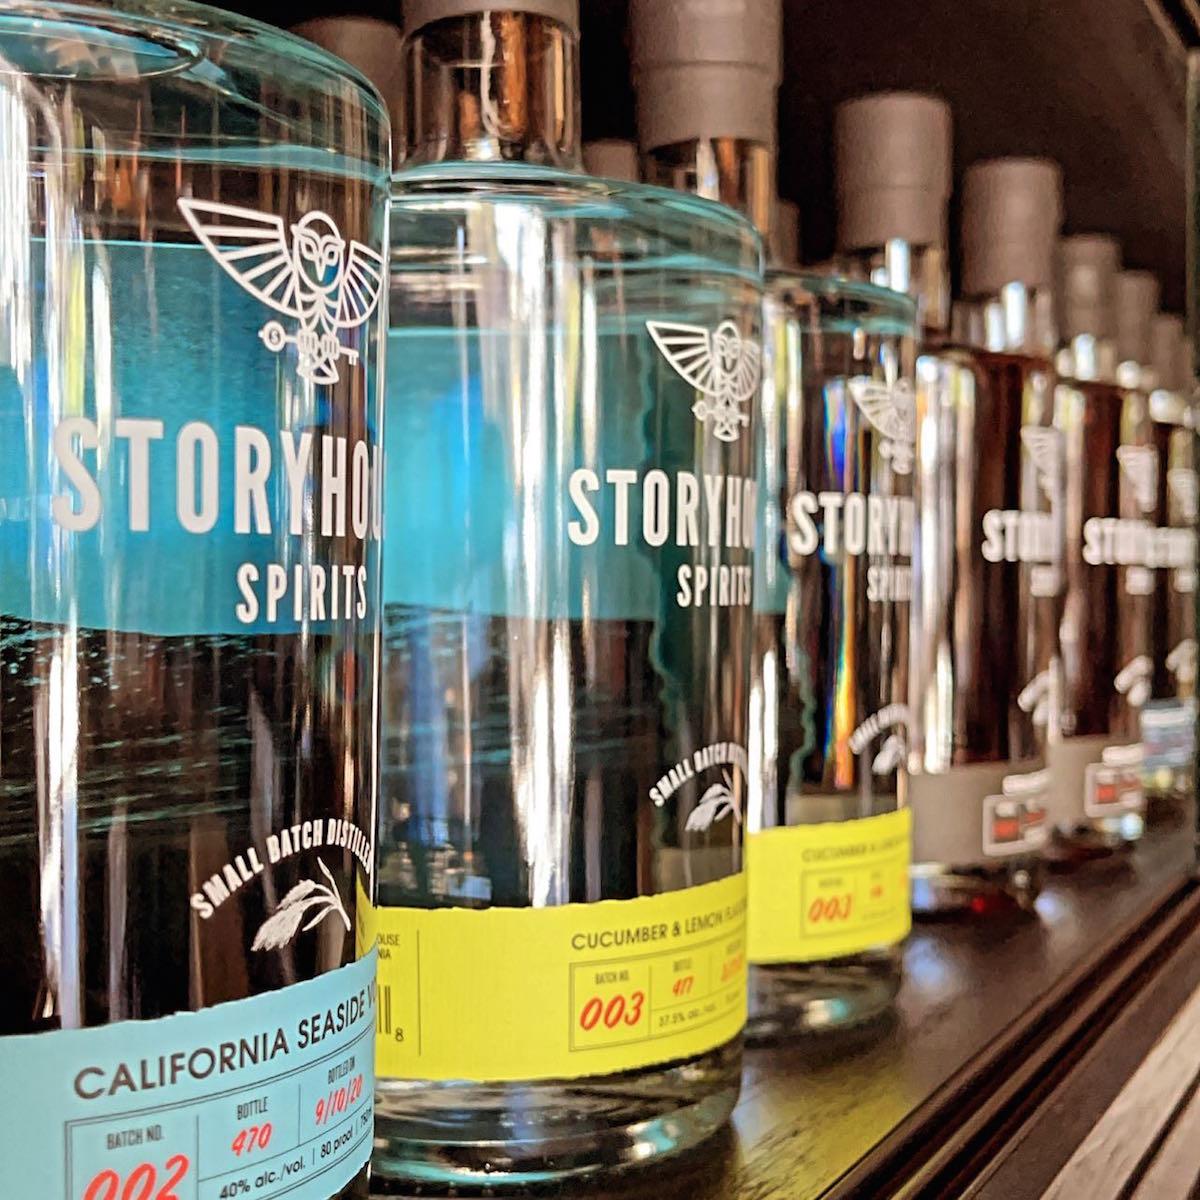 Storyhouse Spirits Set to Open Its Doors This Week